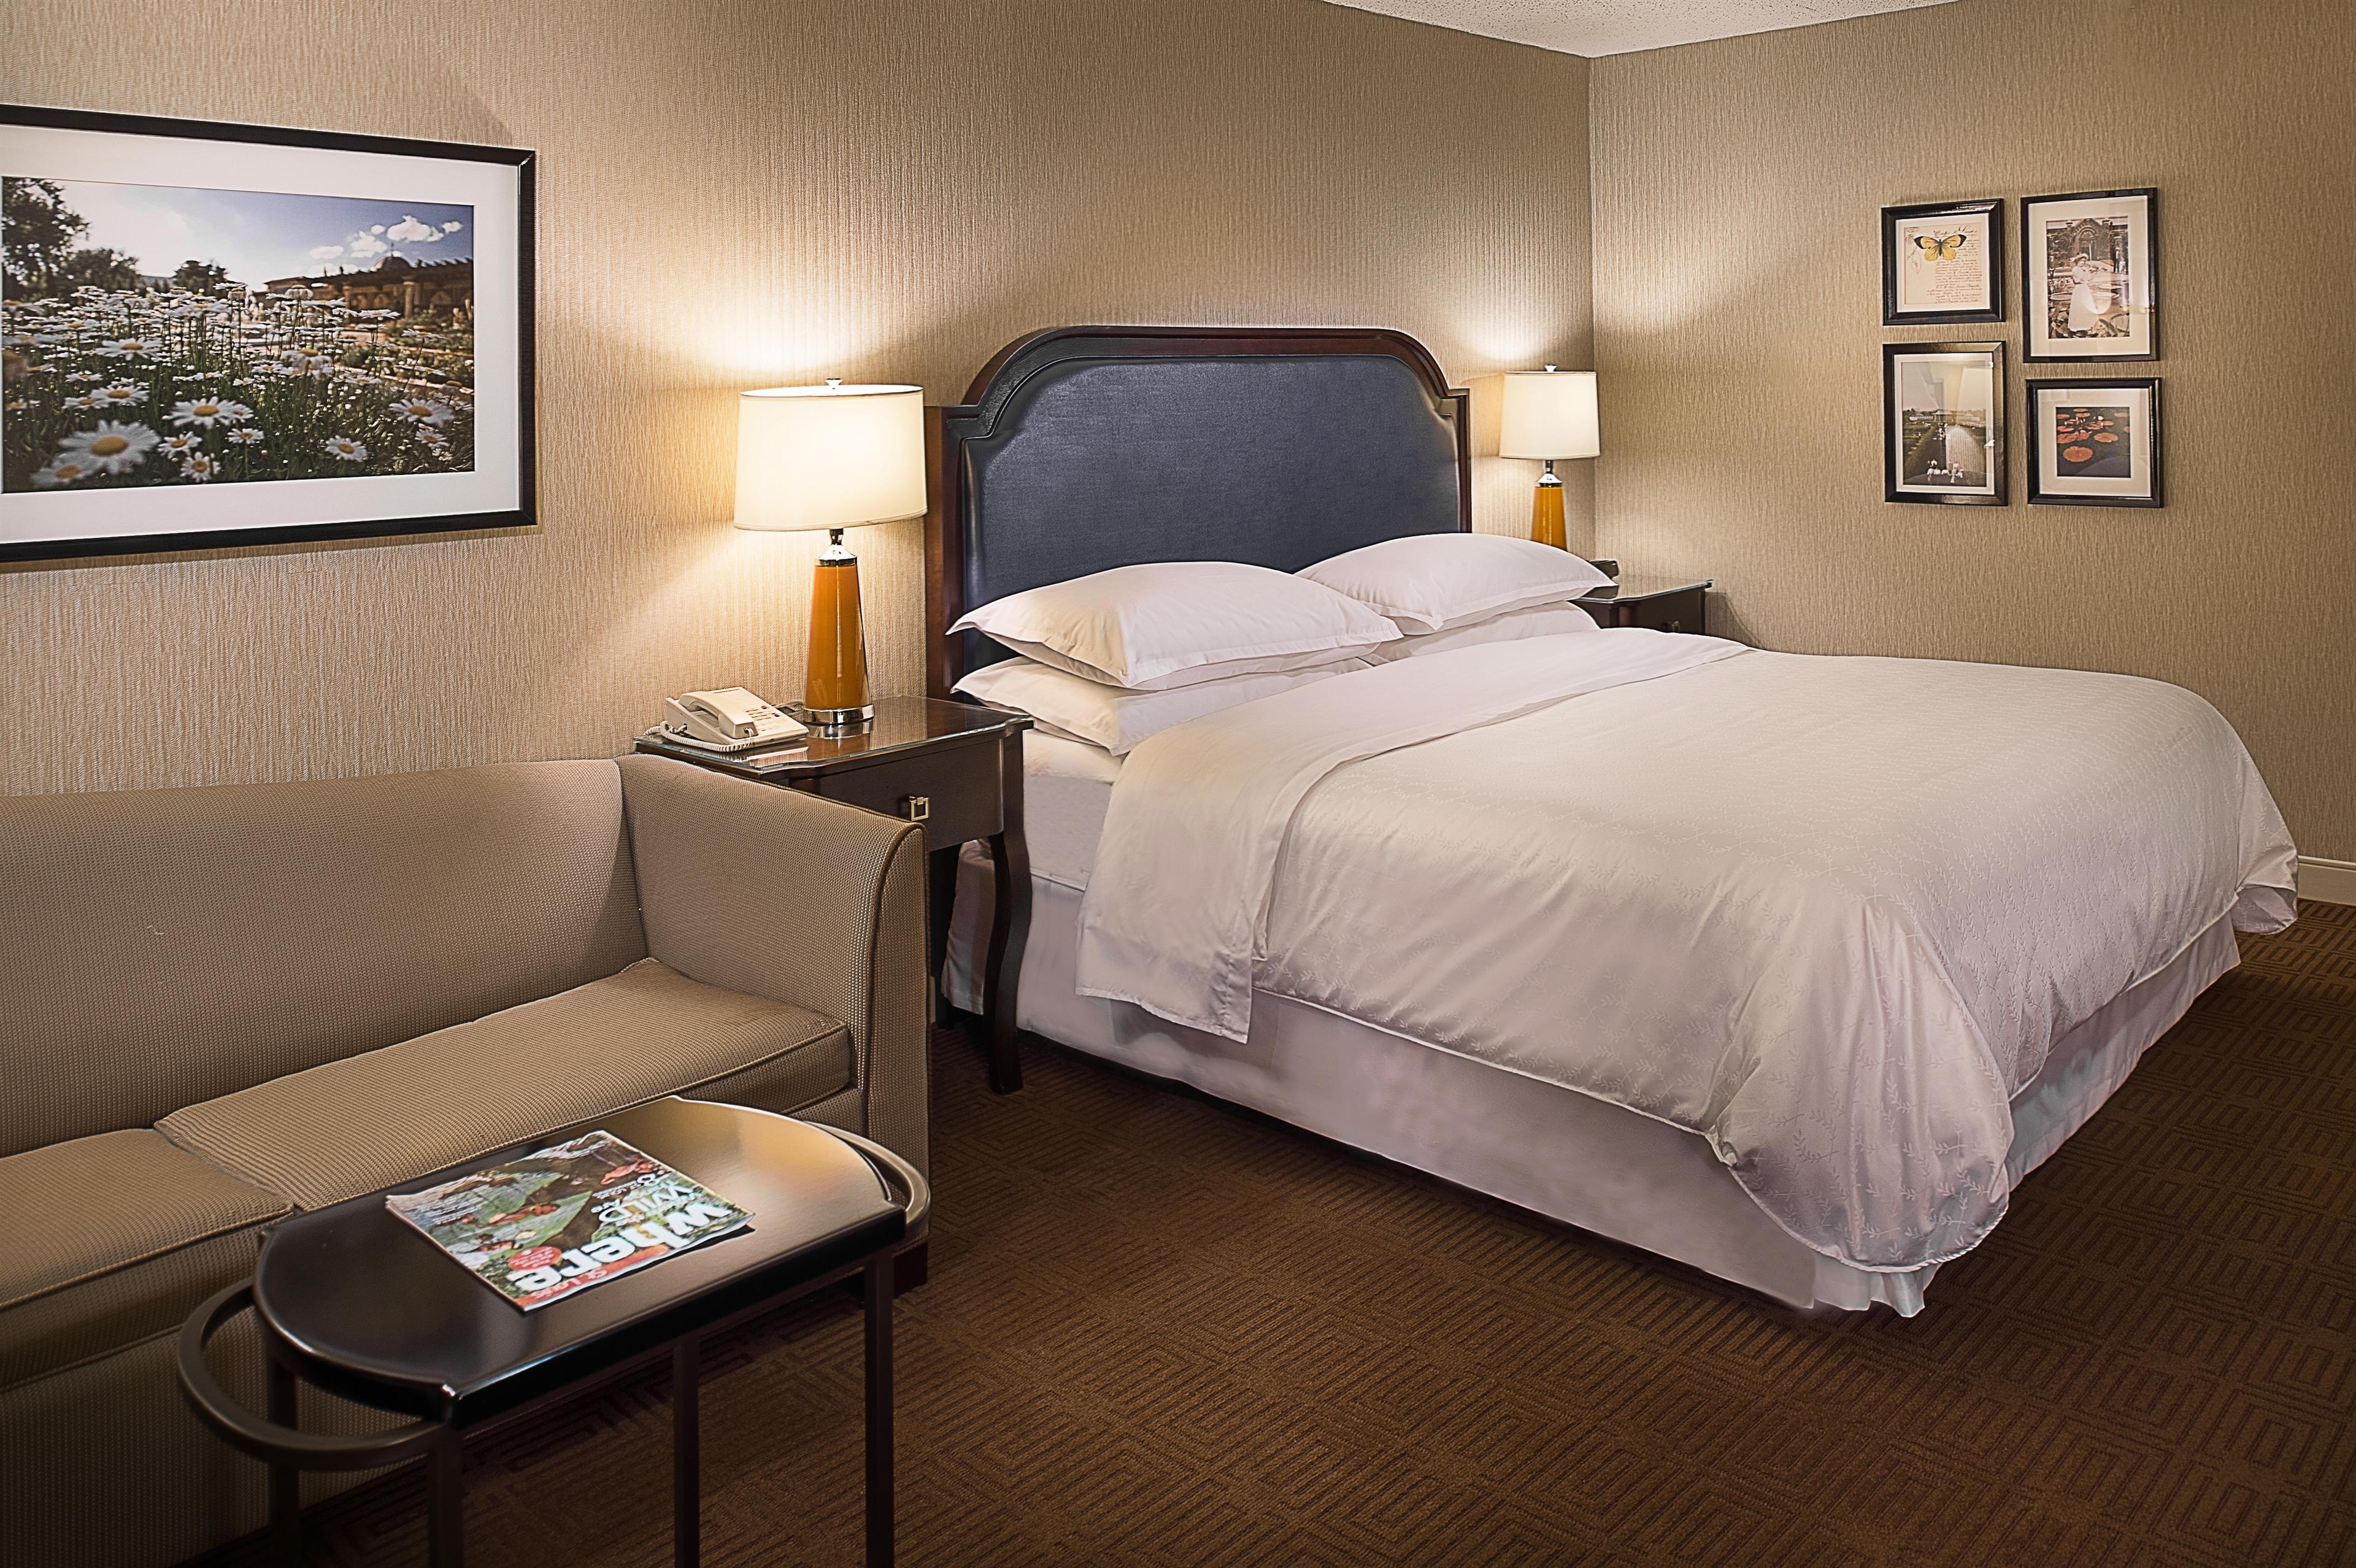 Sheraton Westport Plaza Hotel St. Louis image 26